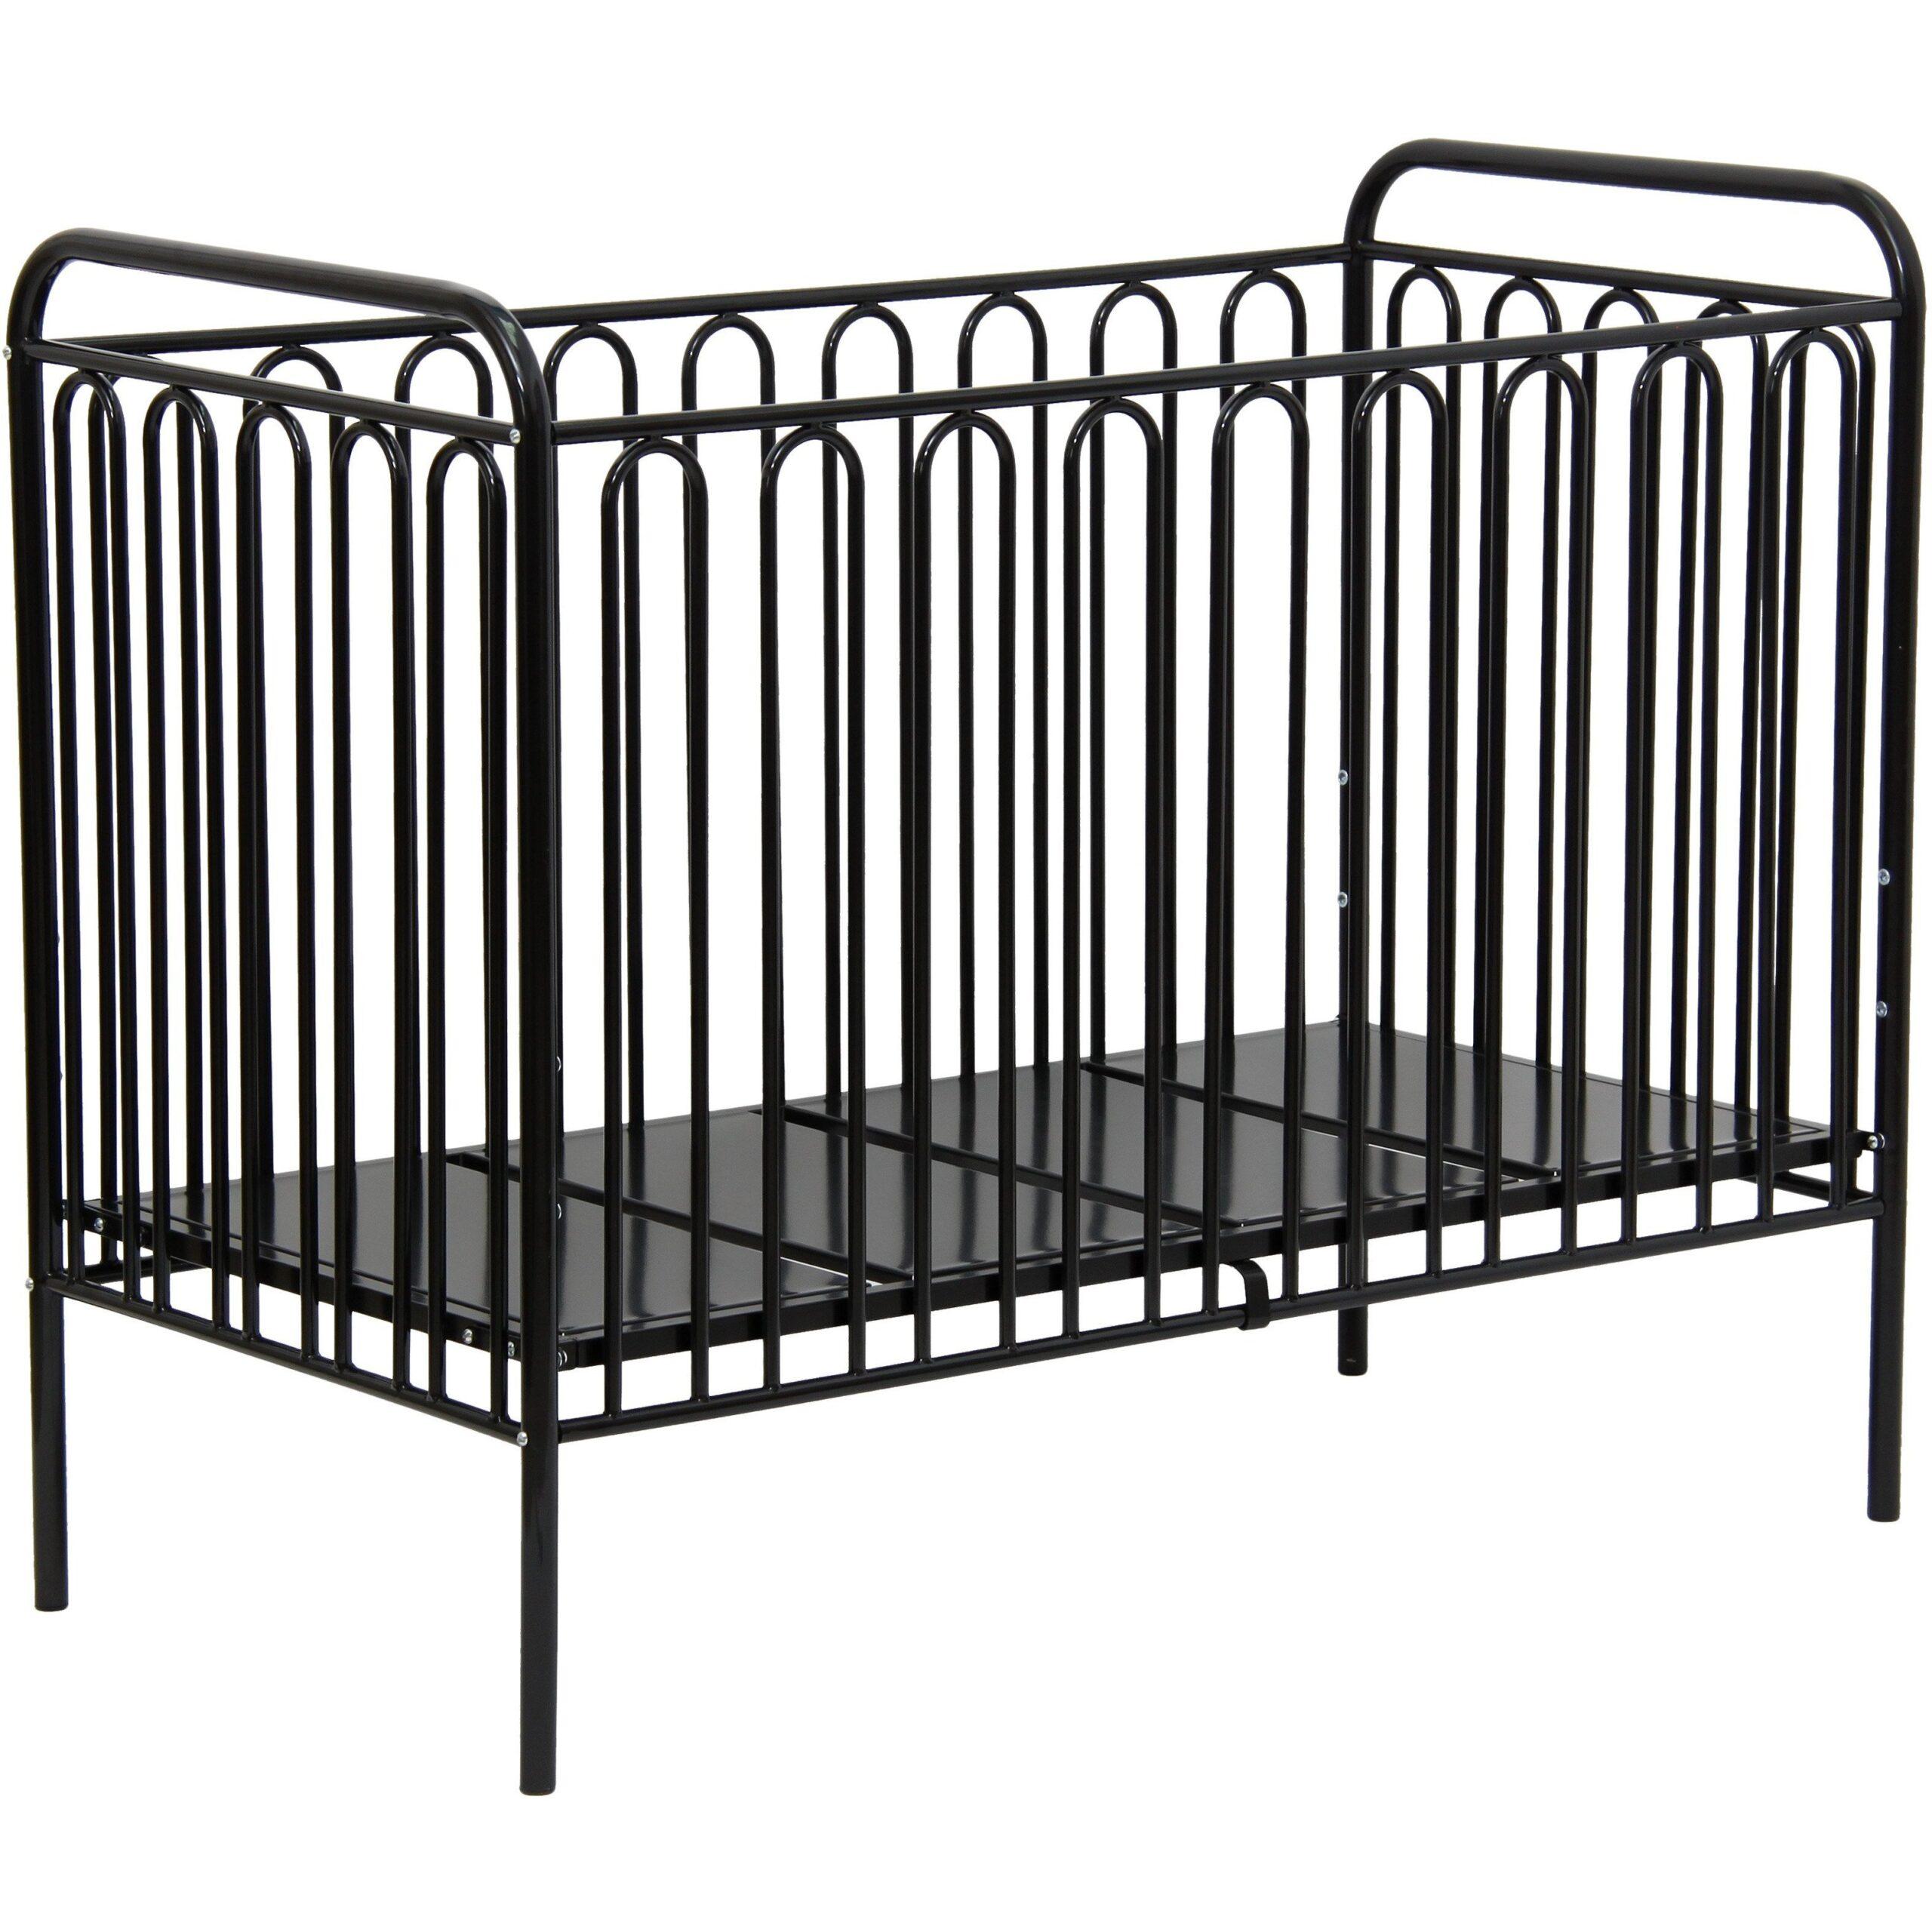 Full Size of Babybett Schwarz Kinderbett Gitterbett Aus Metall Polini 150 Bett 180x200 Weiß Schwarze Küche Schwarzes Wohnzimmer Babybett Schwarz